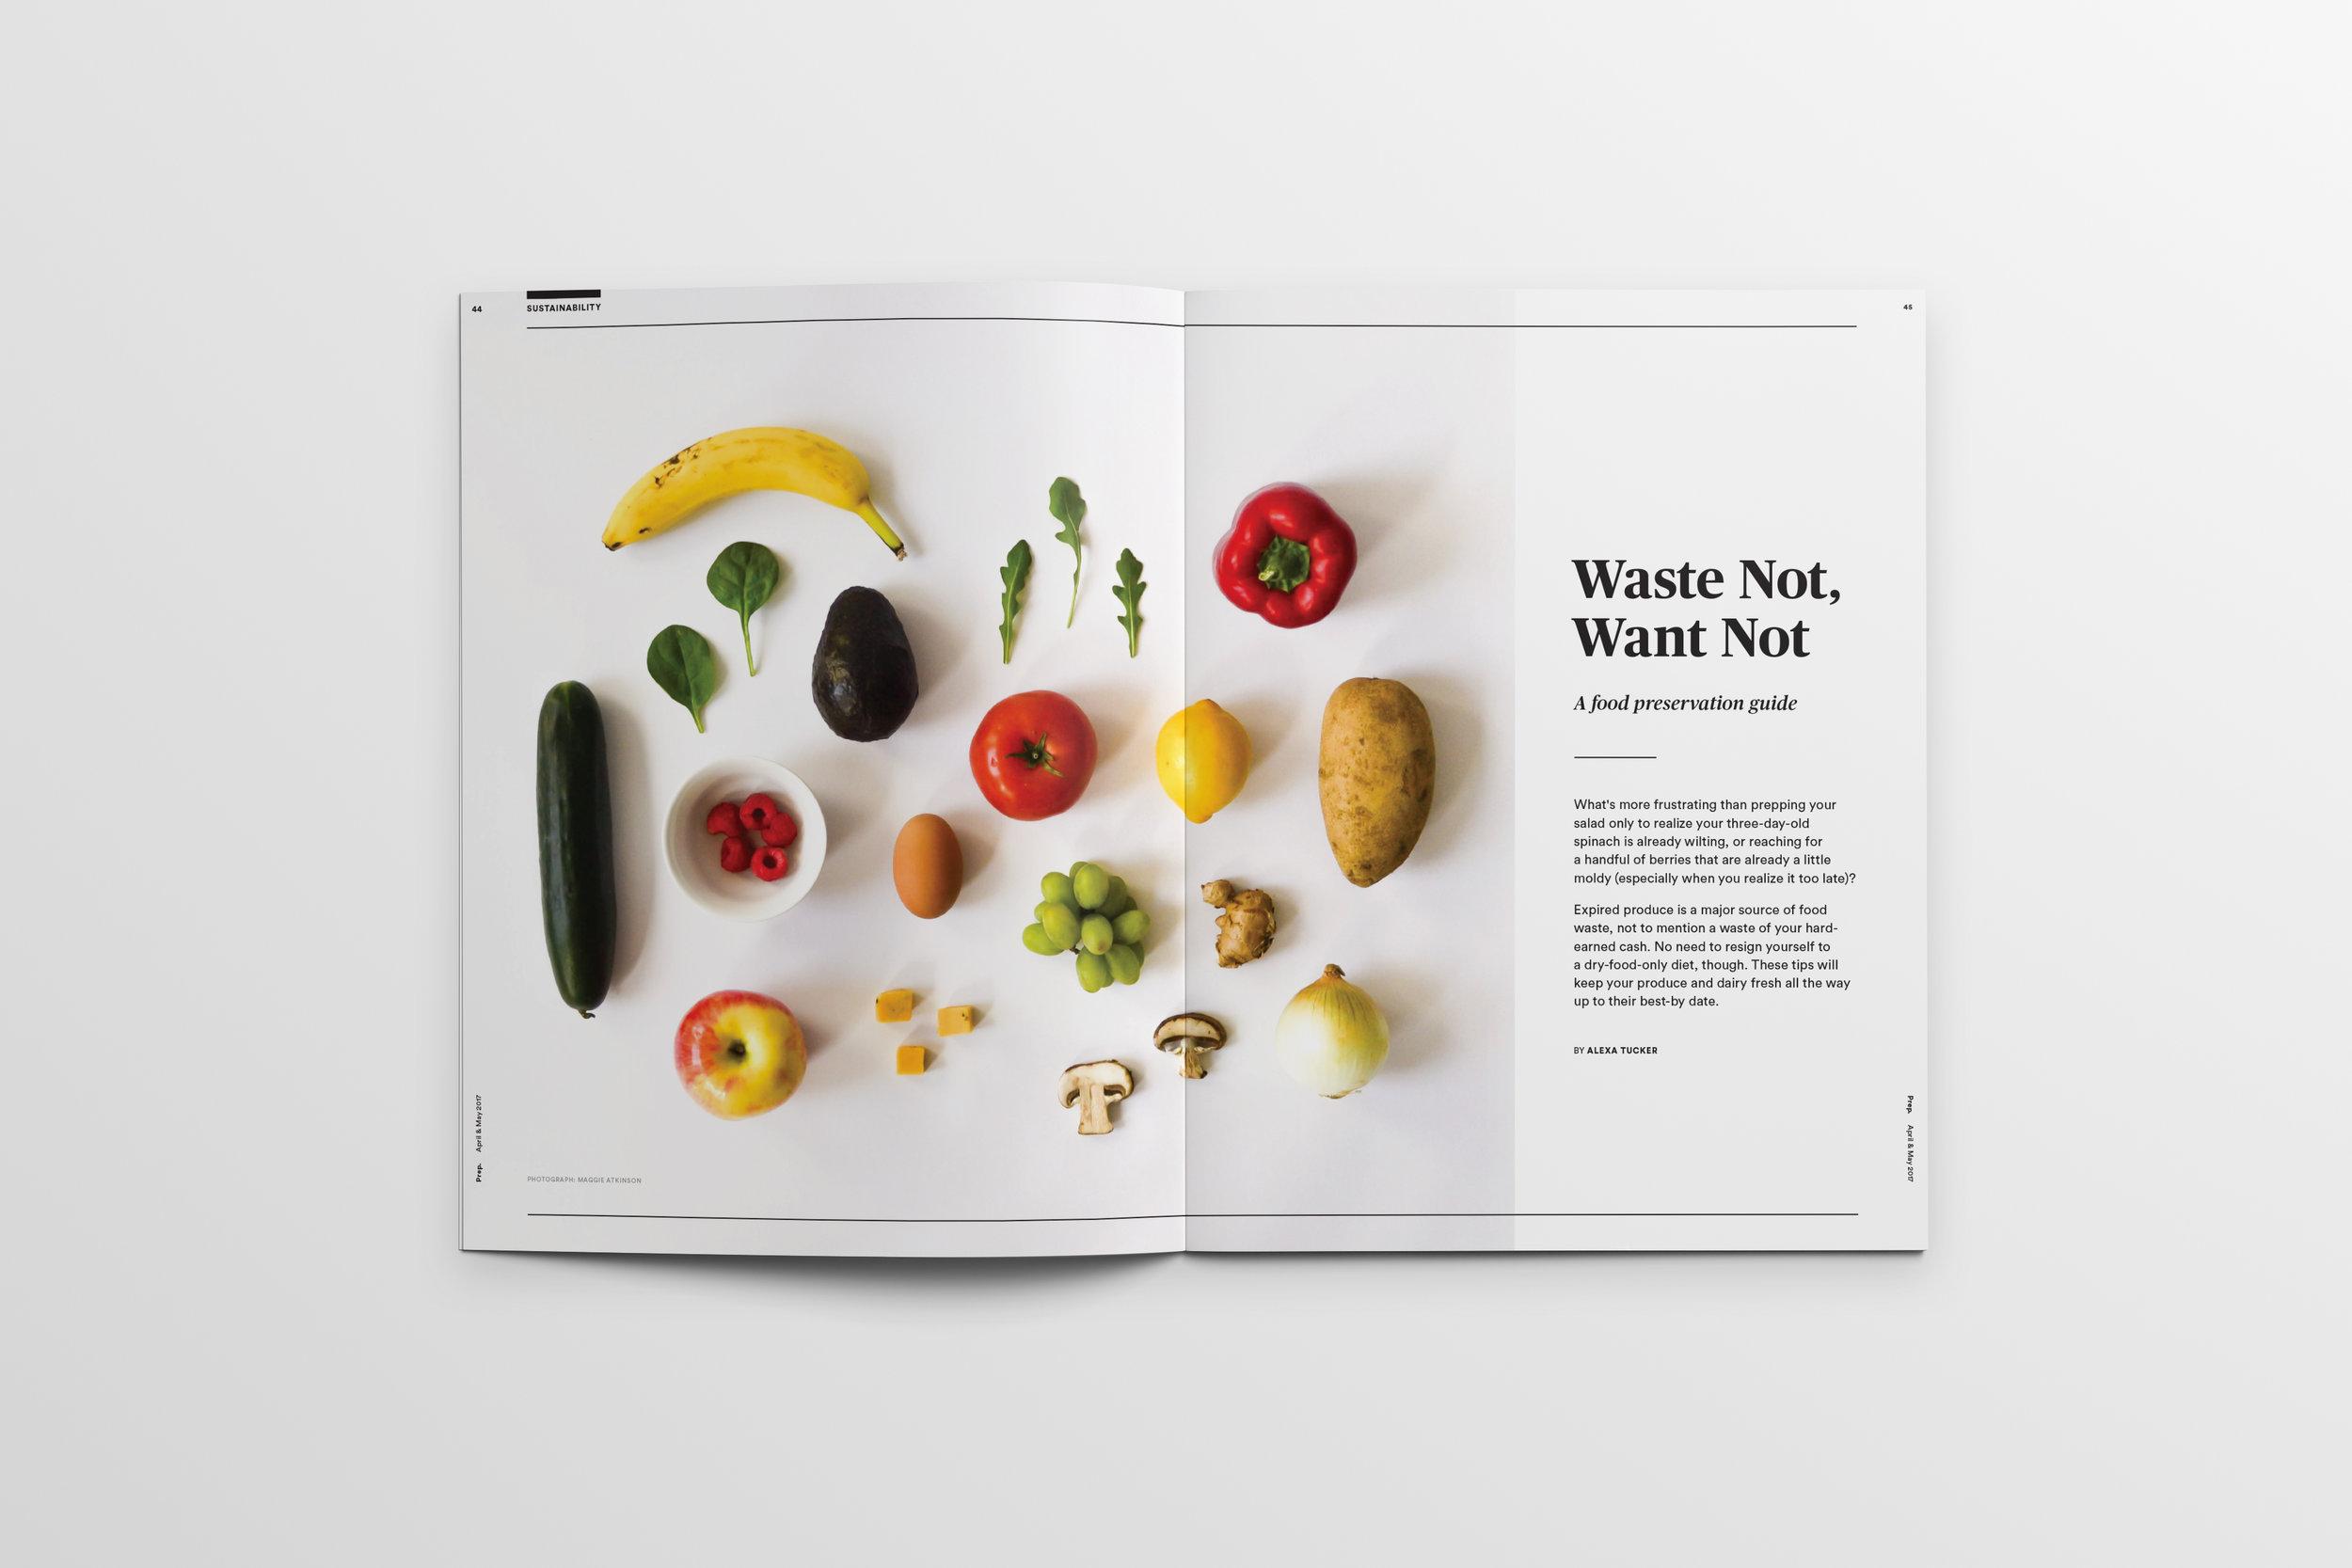 Magazine_Mockup_Pages43-44.jpg